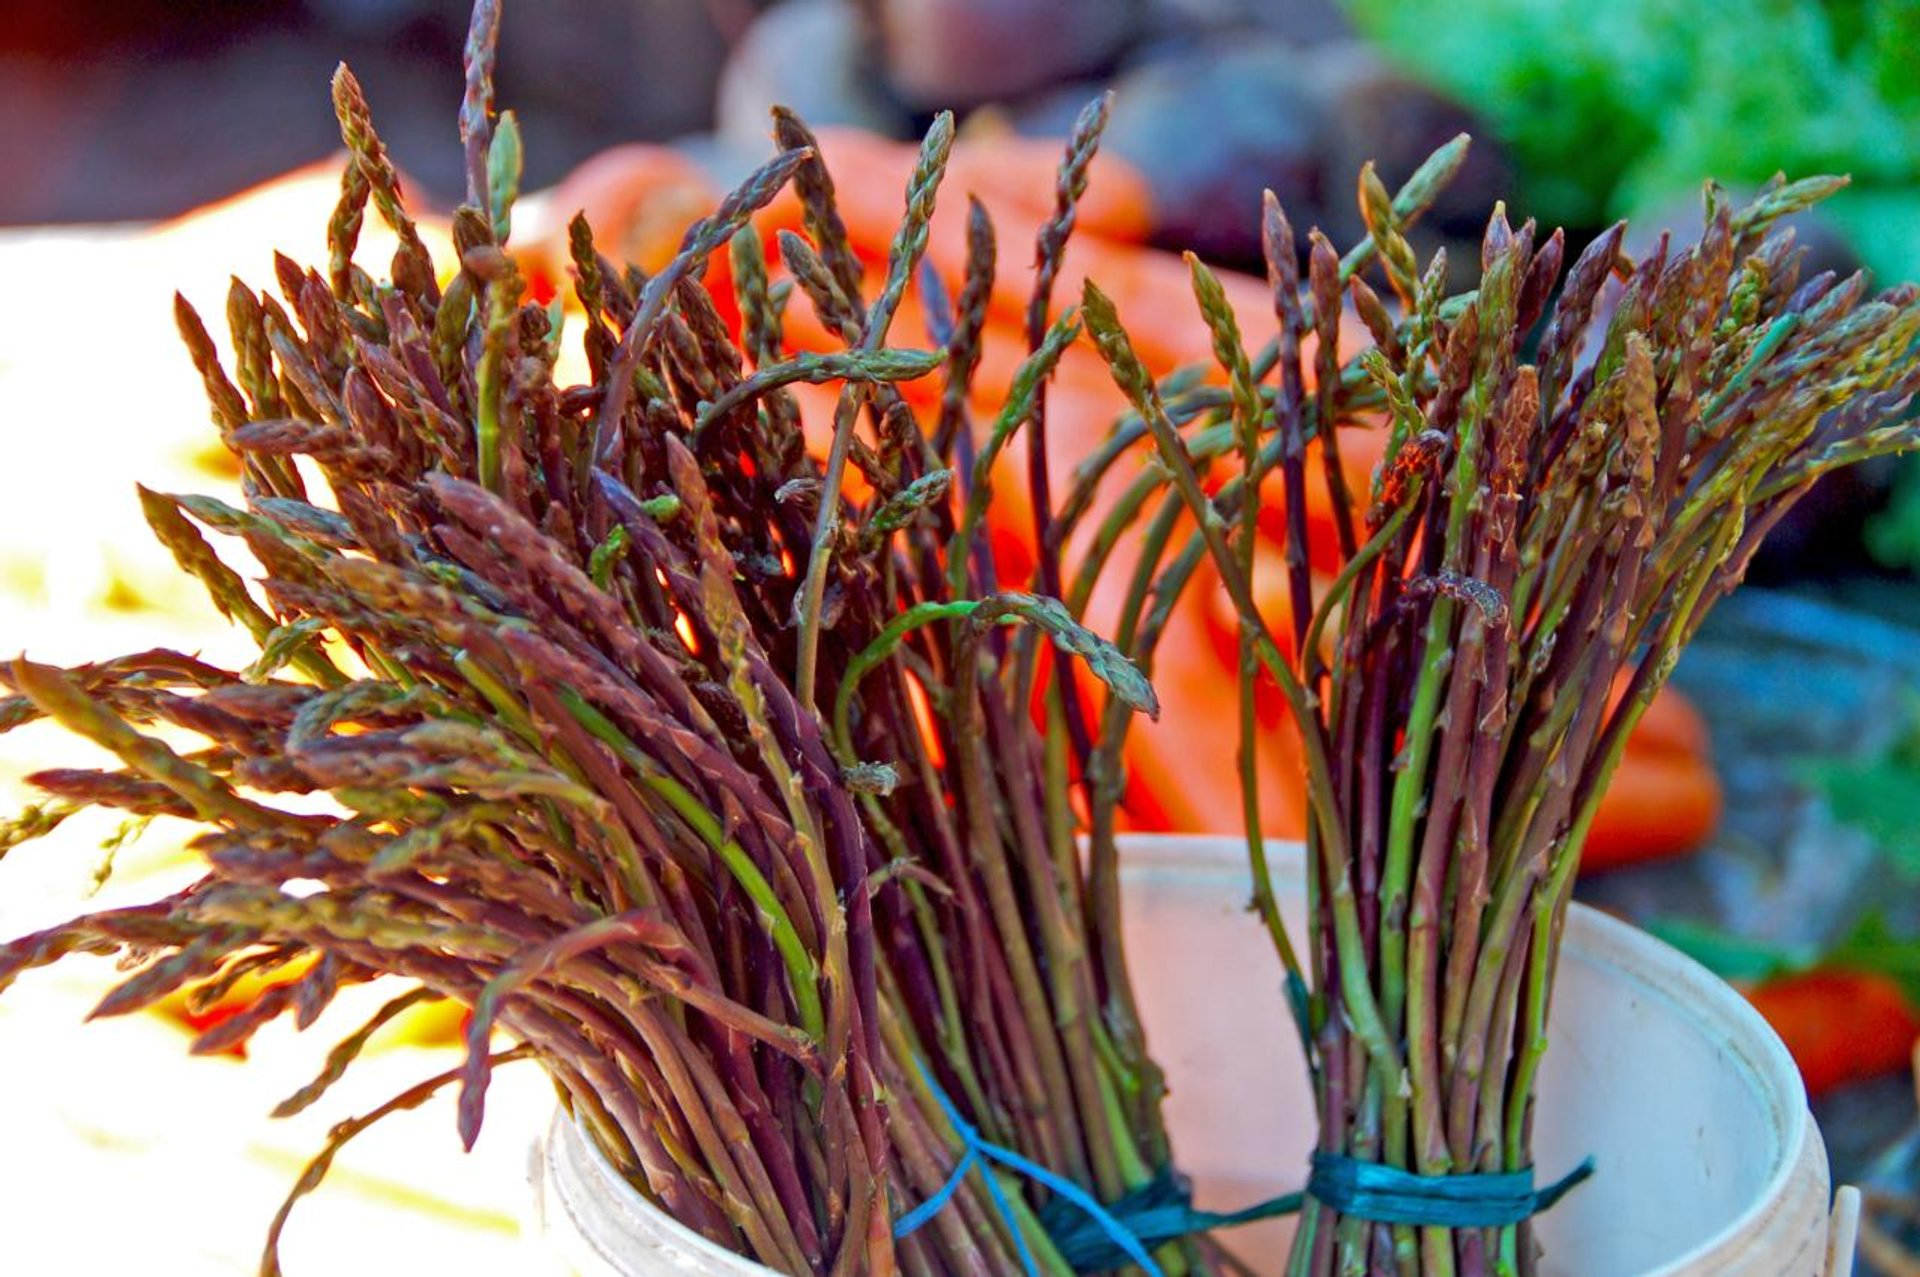 Asparagus Season in Croatia 2020 - Best Time